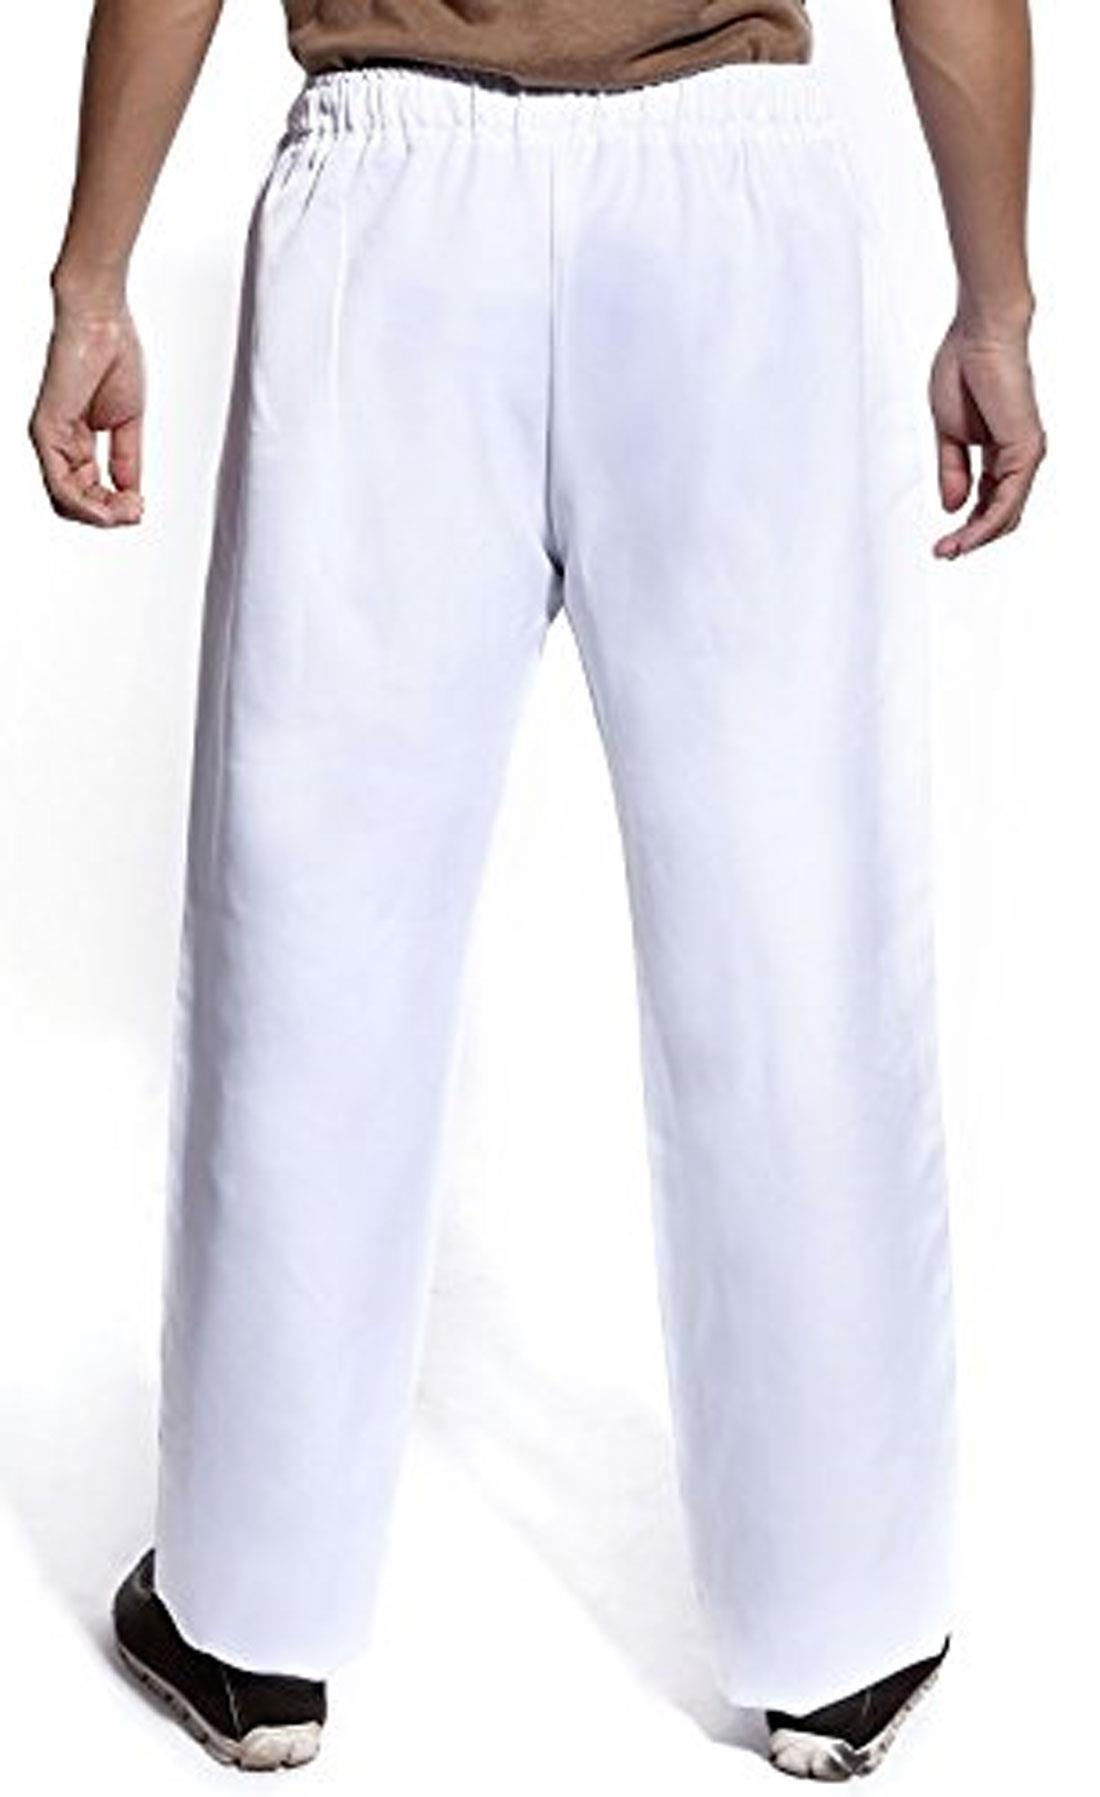 Da Uomo Bianca Chef alimentare Vita Elasticizzata Pantaloni Donna Work Wear Pantaloni